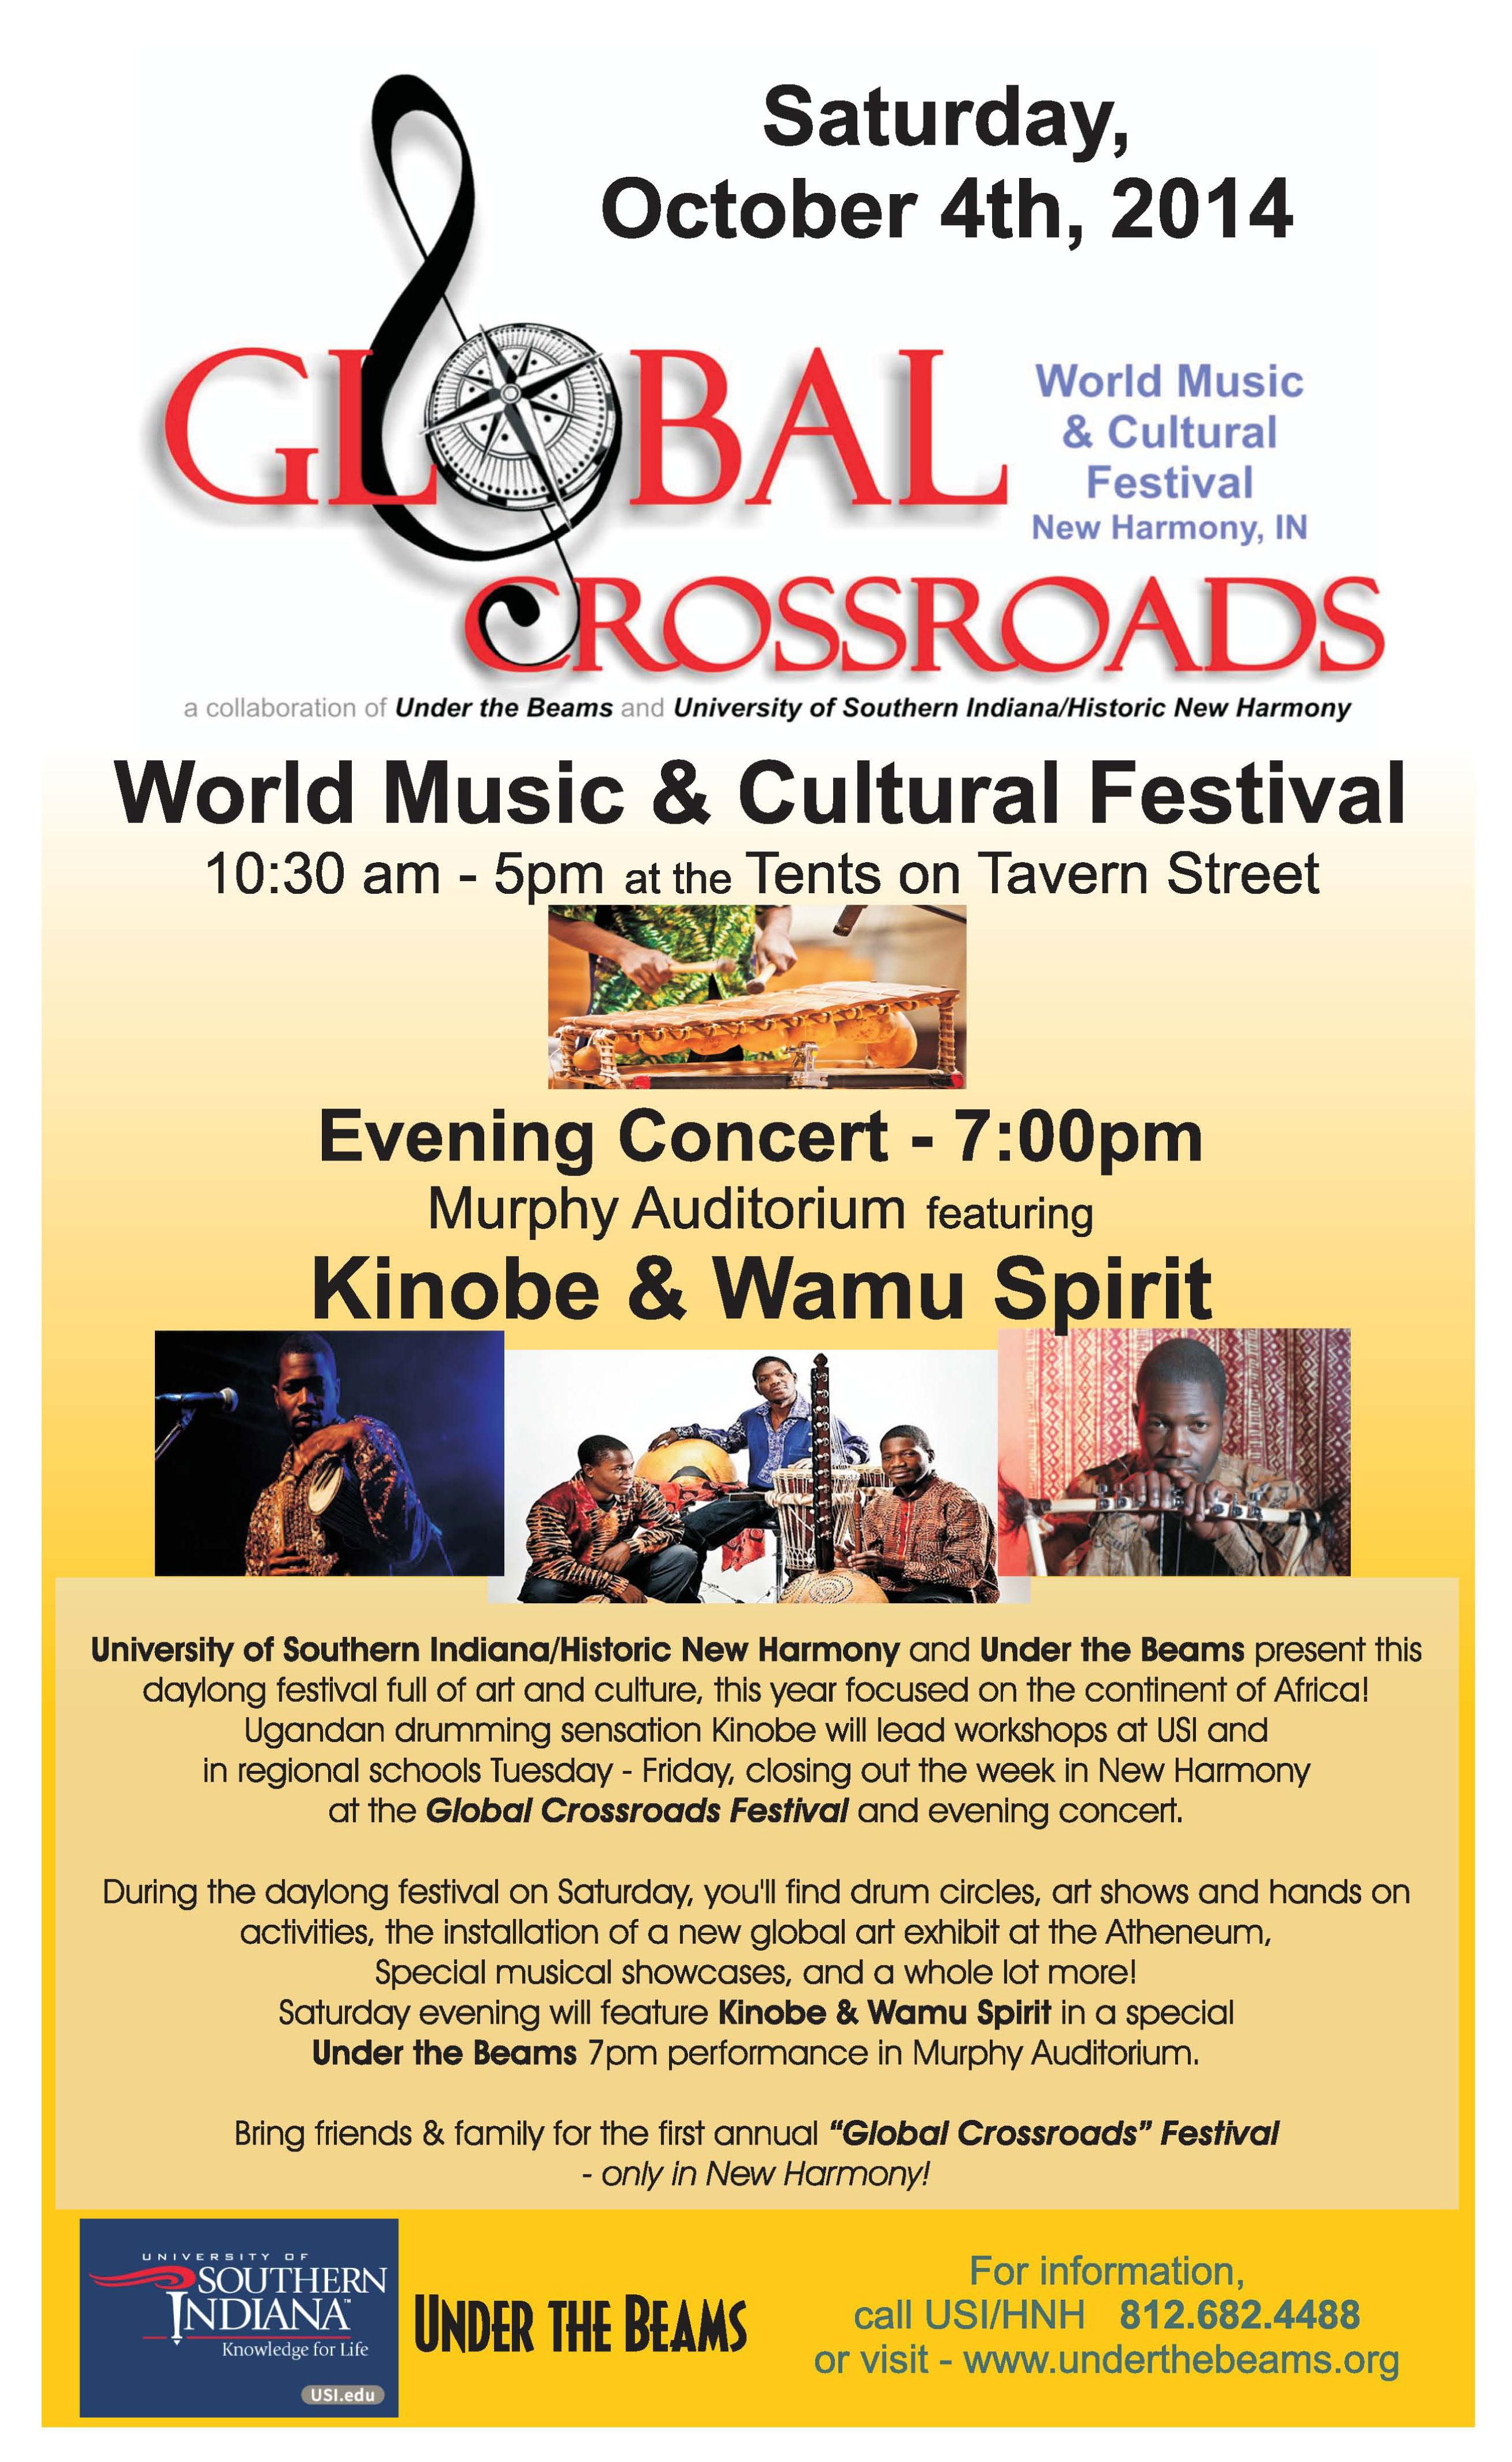 Global_Crossroads_fest_poster_rszd